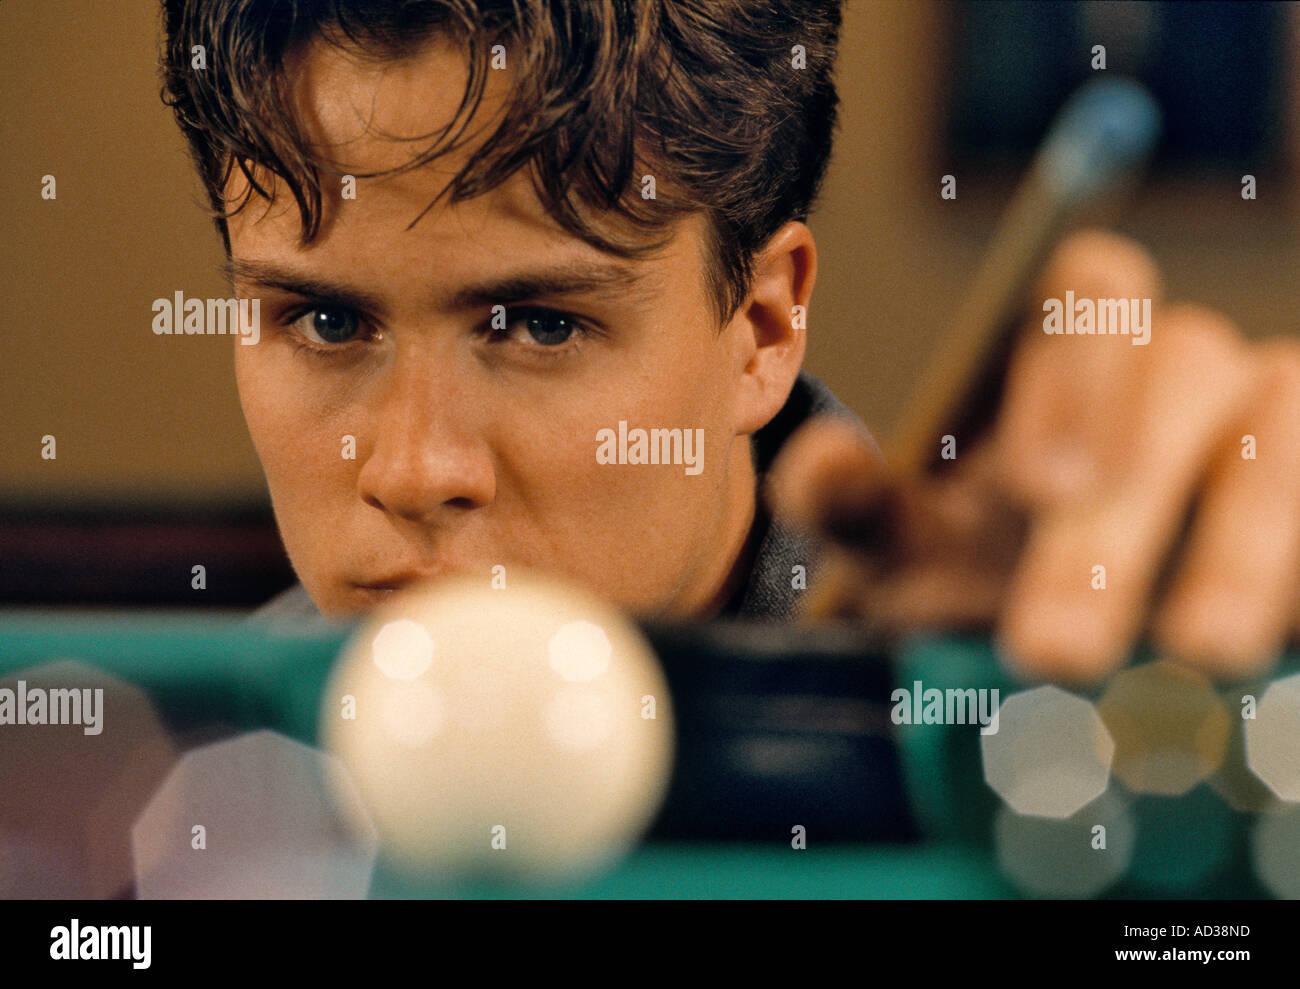 Young man playing pool. - Stock Image